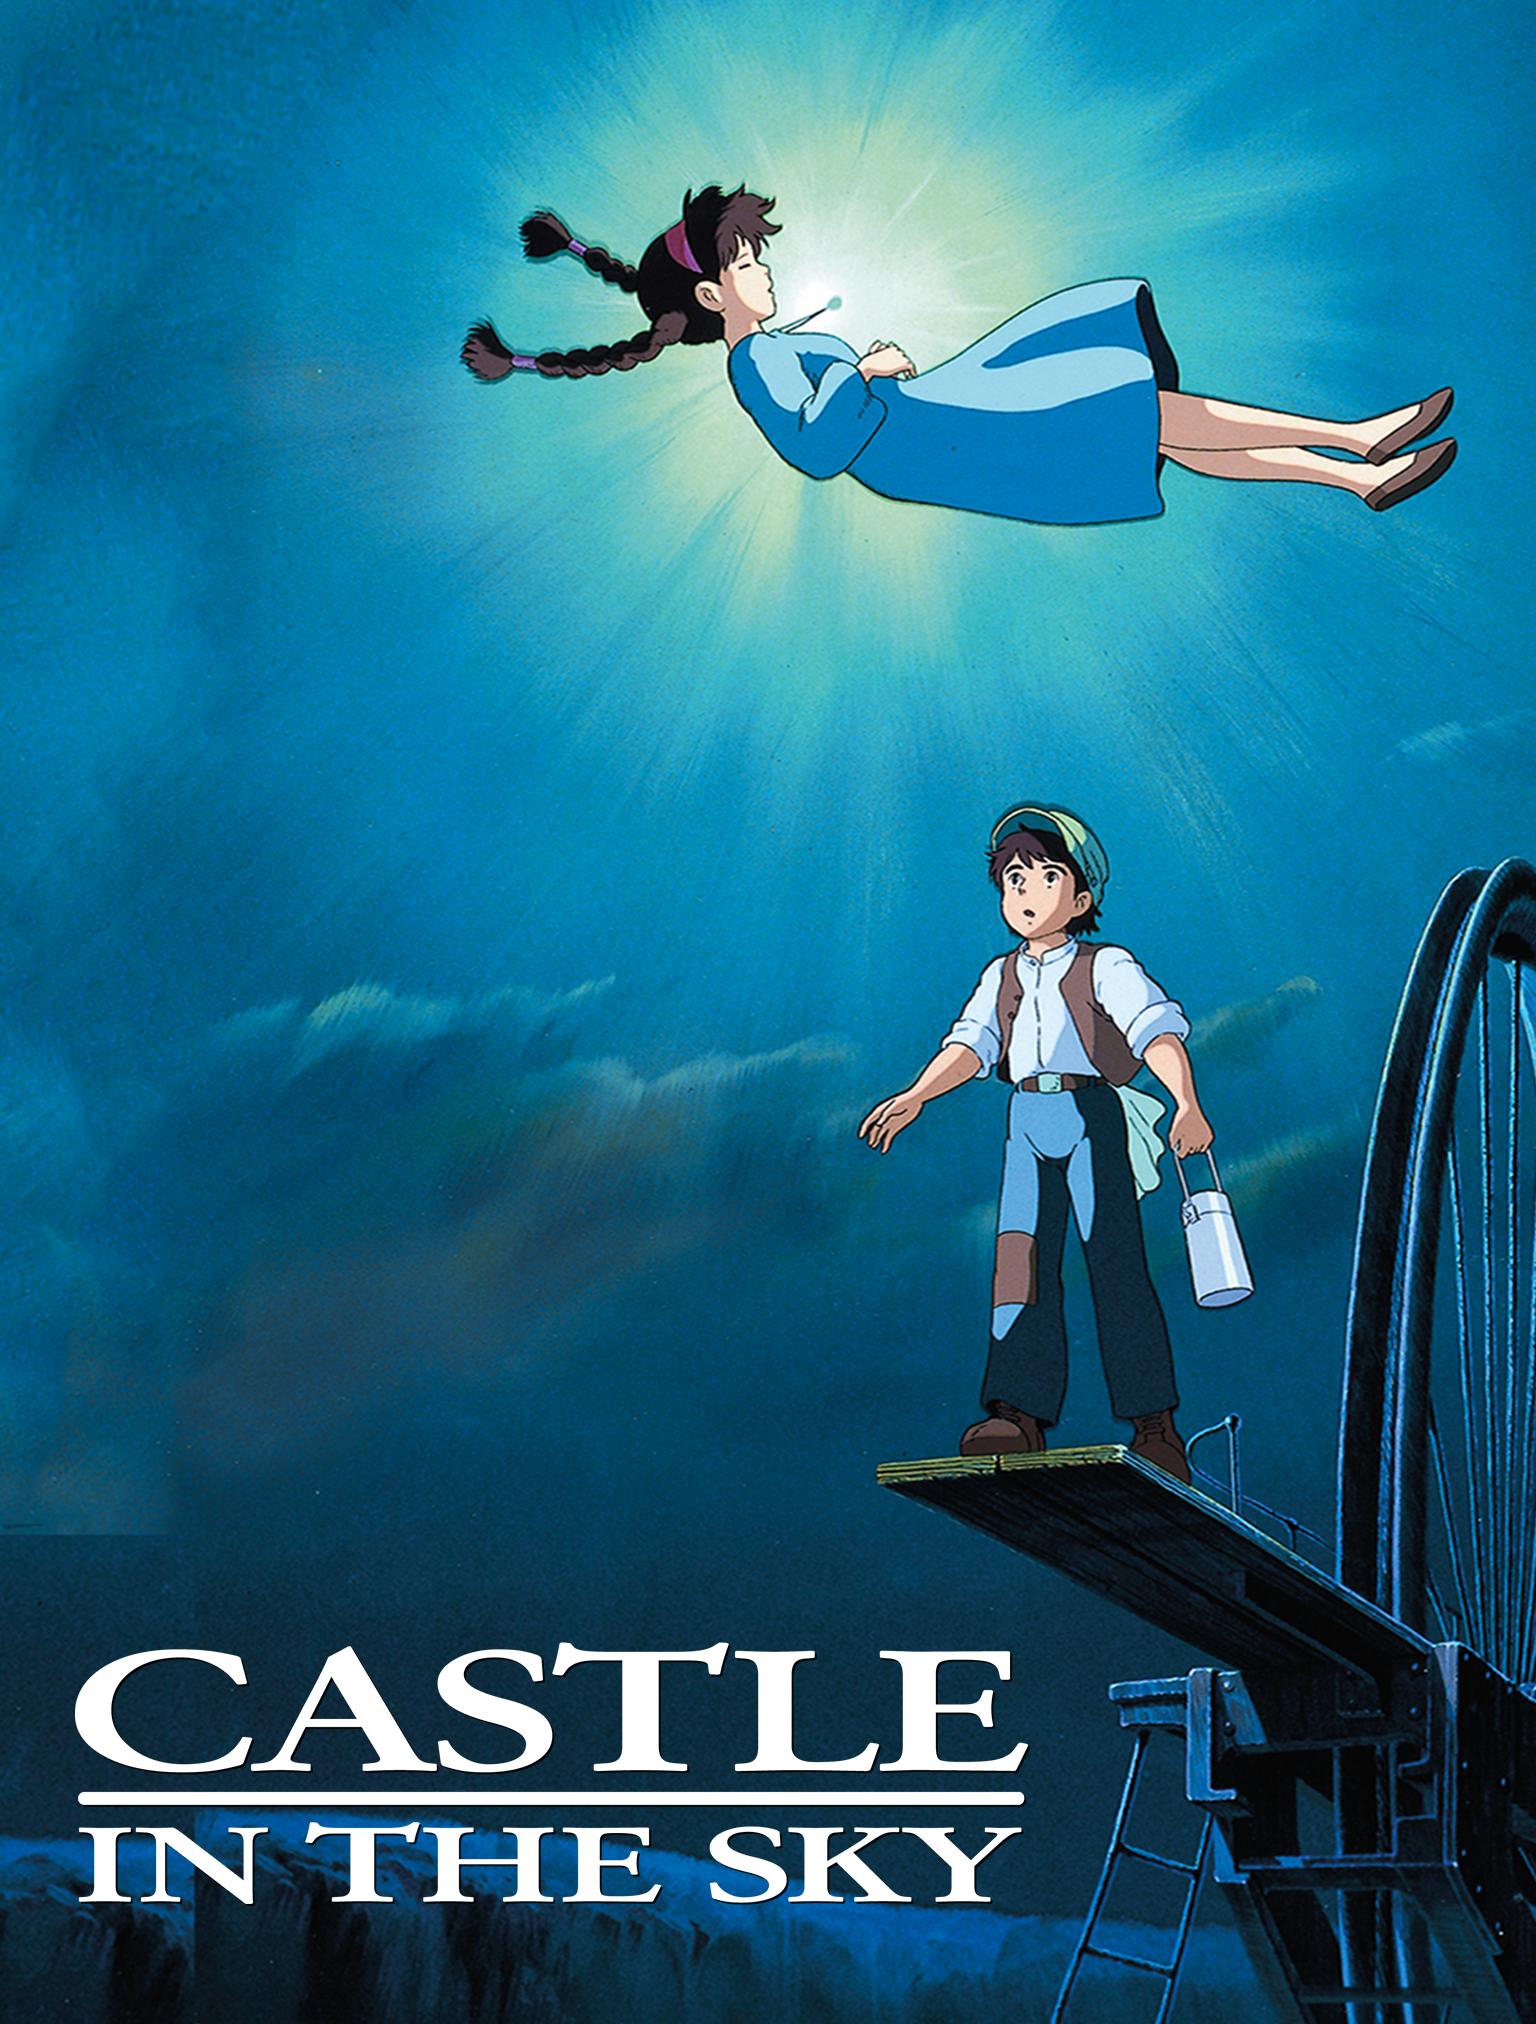 دانلود انیمیشن Castle in the Sky 1986 دوبله فارسی